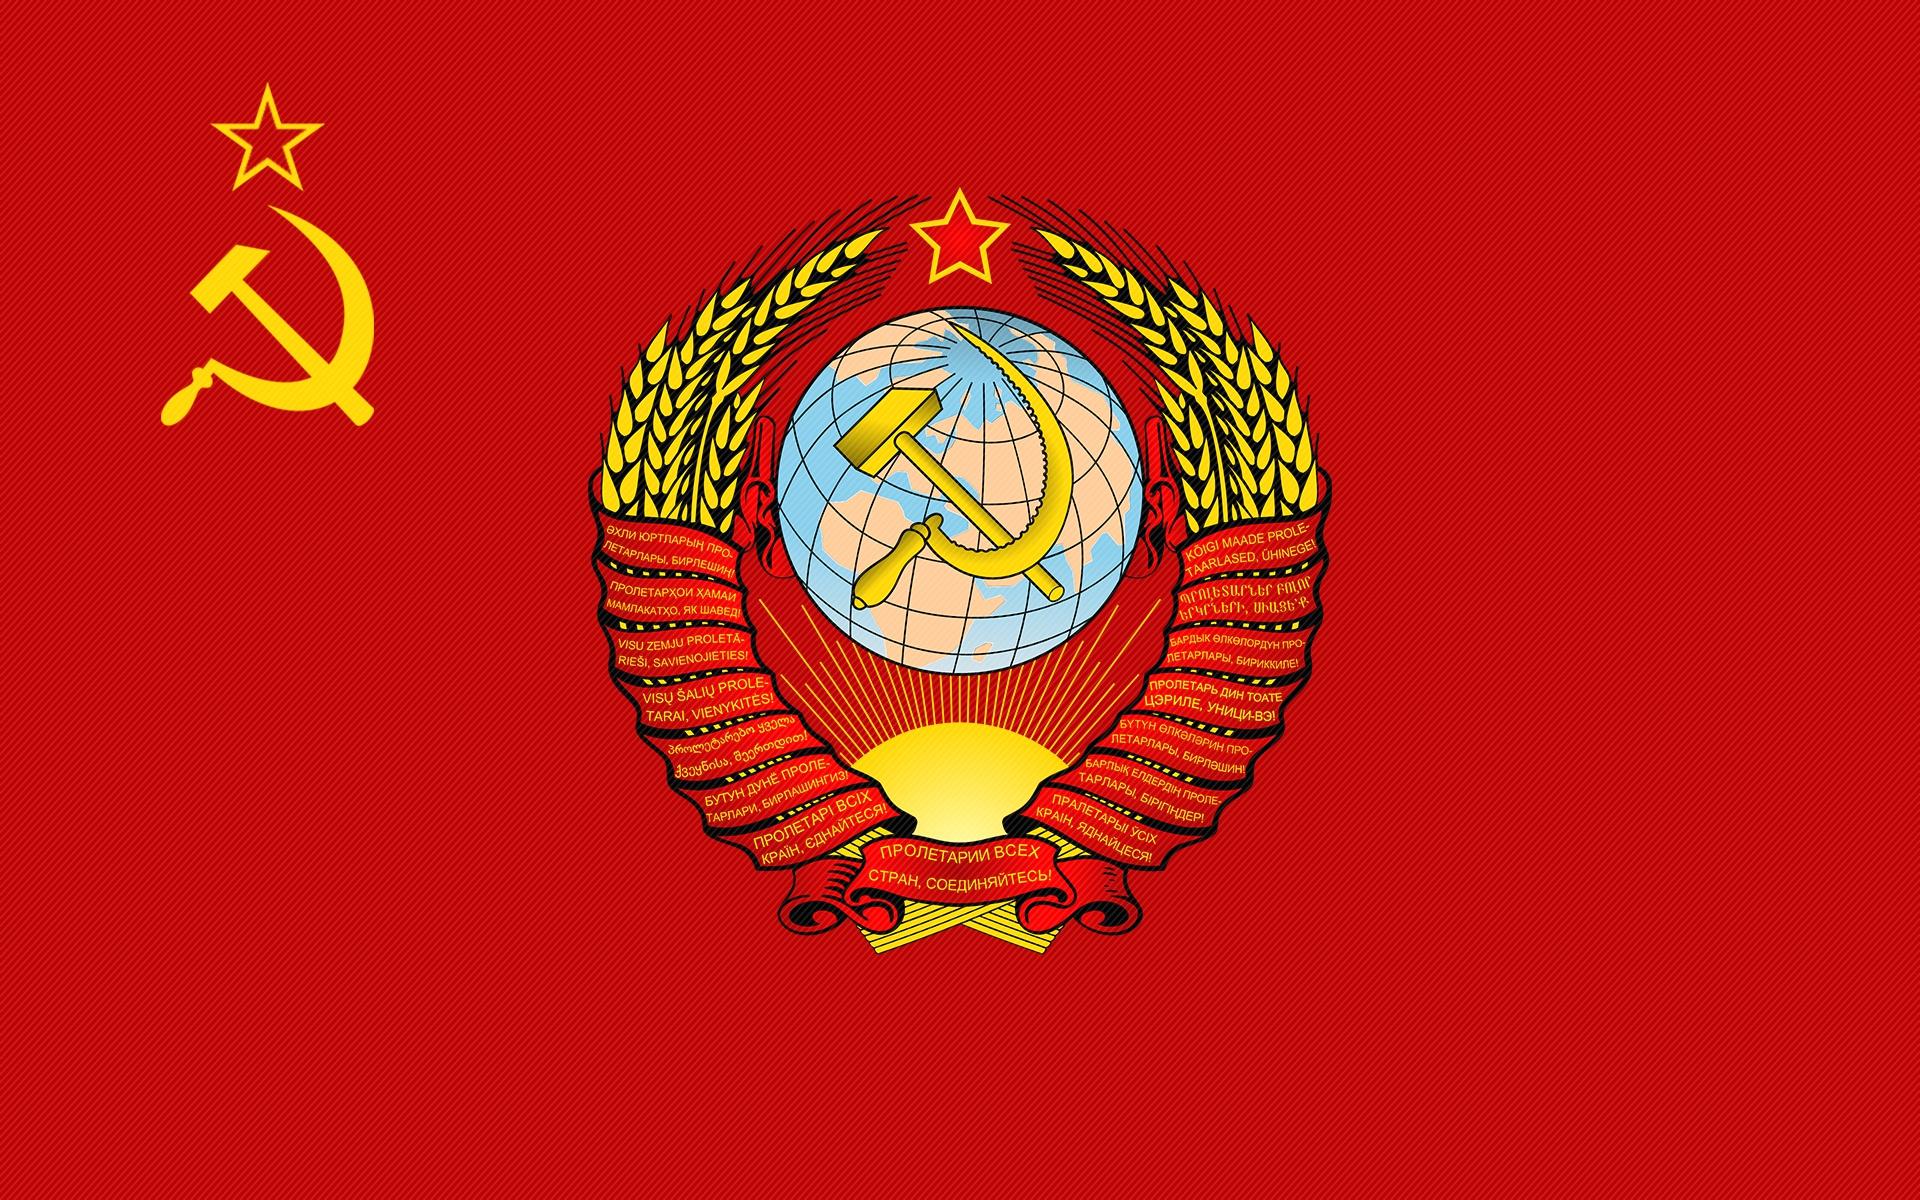 Картинка советский флаг